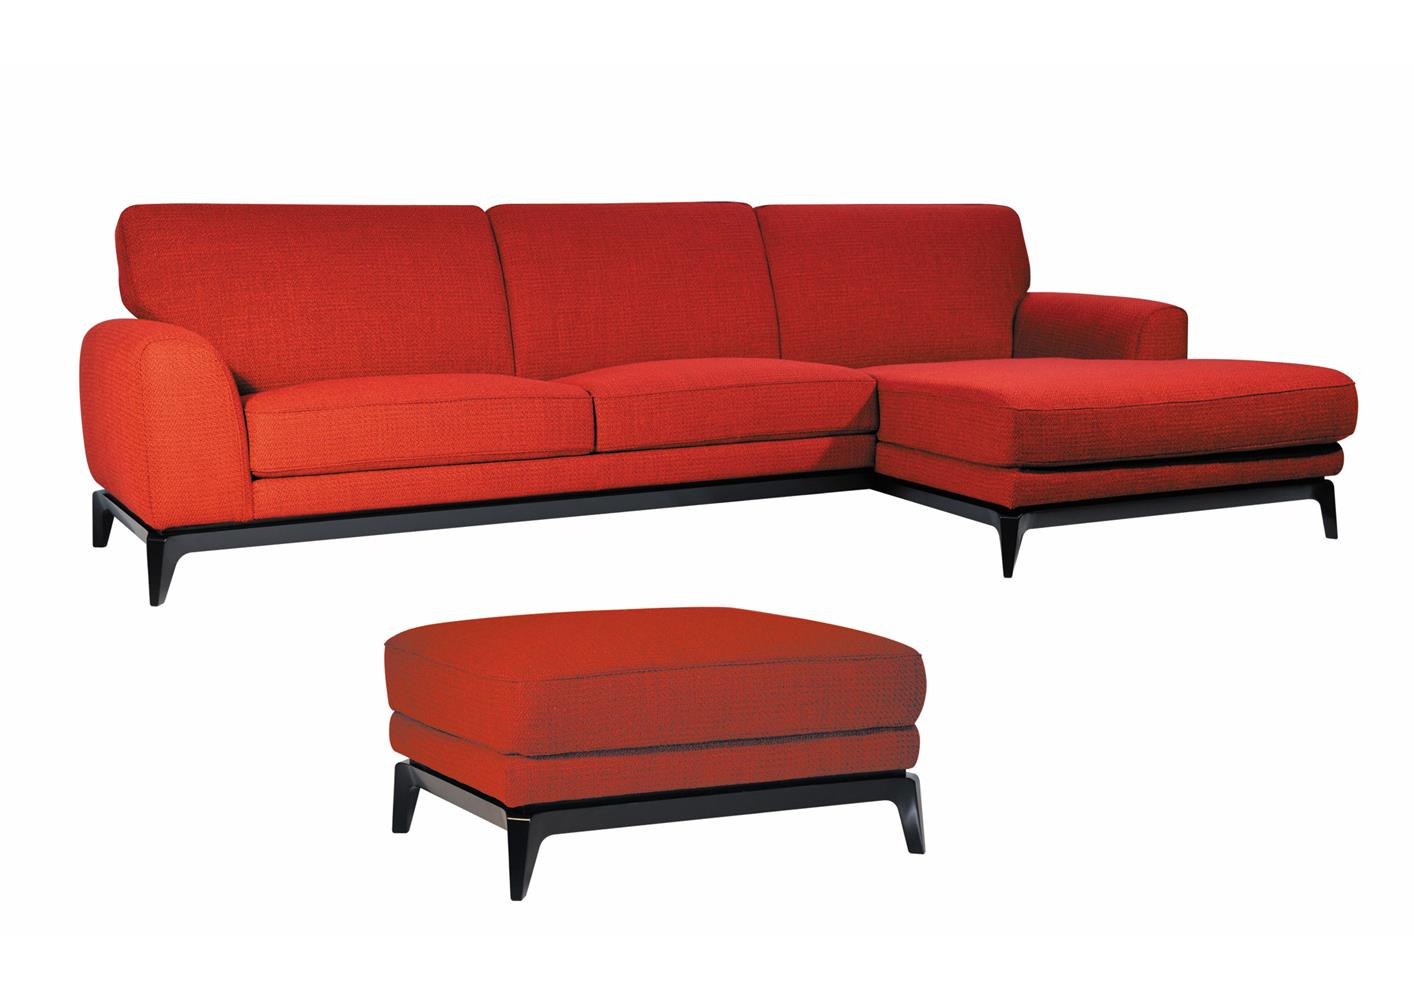 Acheter Canapé D Angle Acheter Votre Canapé D Angle Méri Nne Moderne Avec Grand